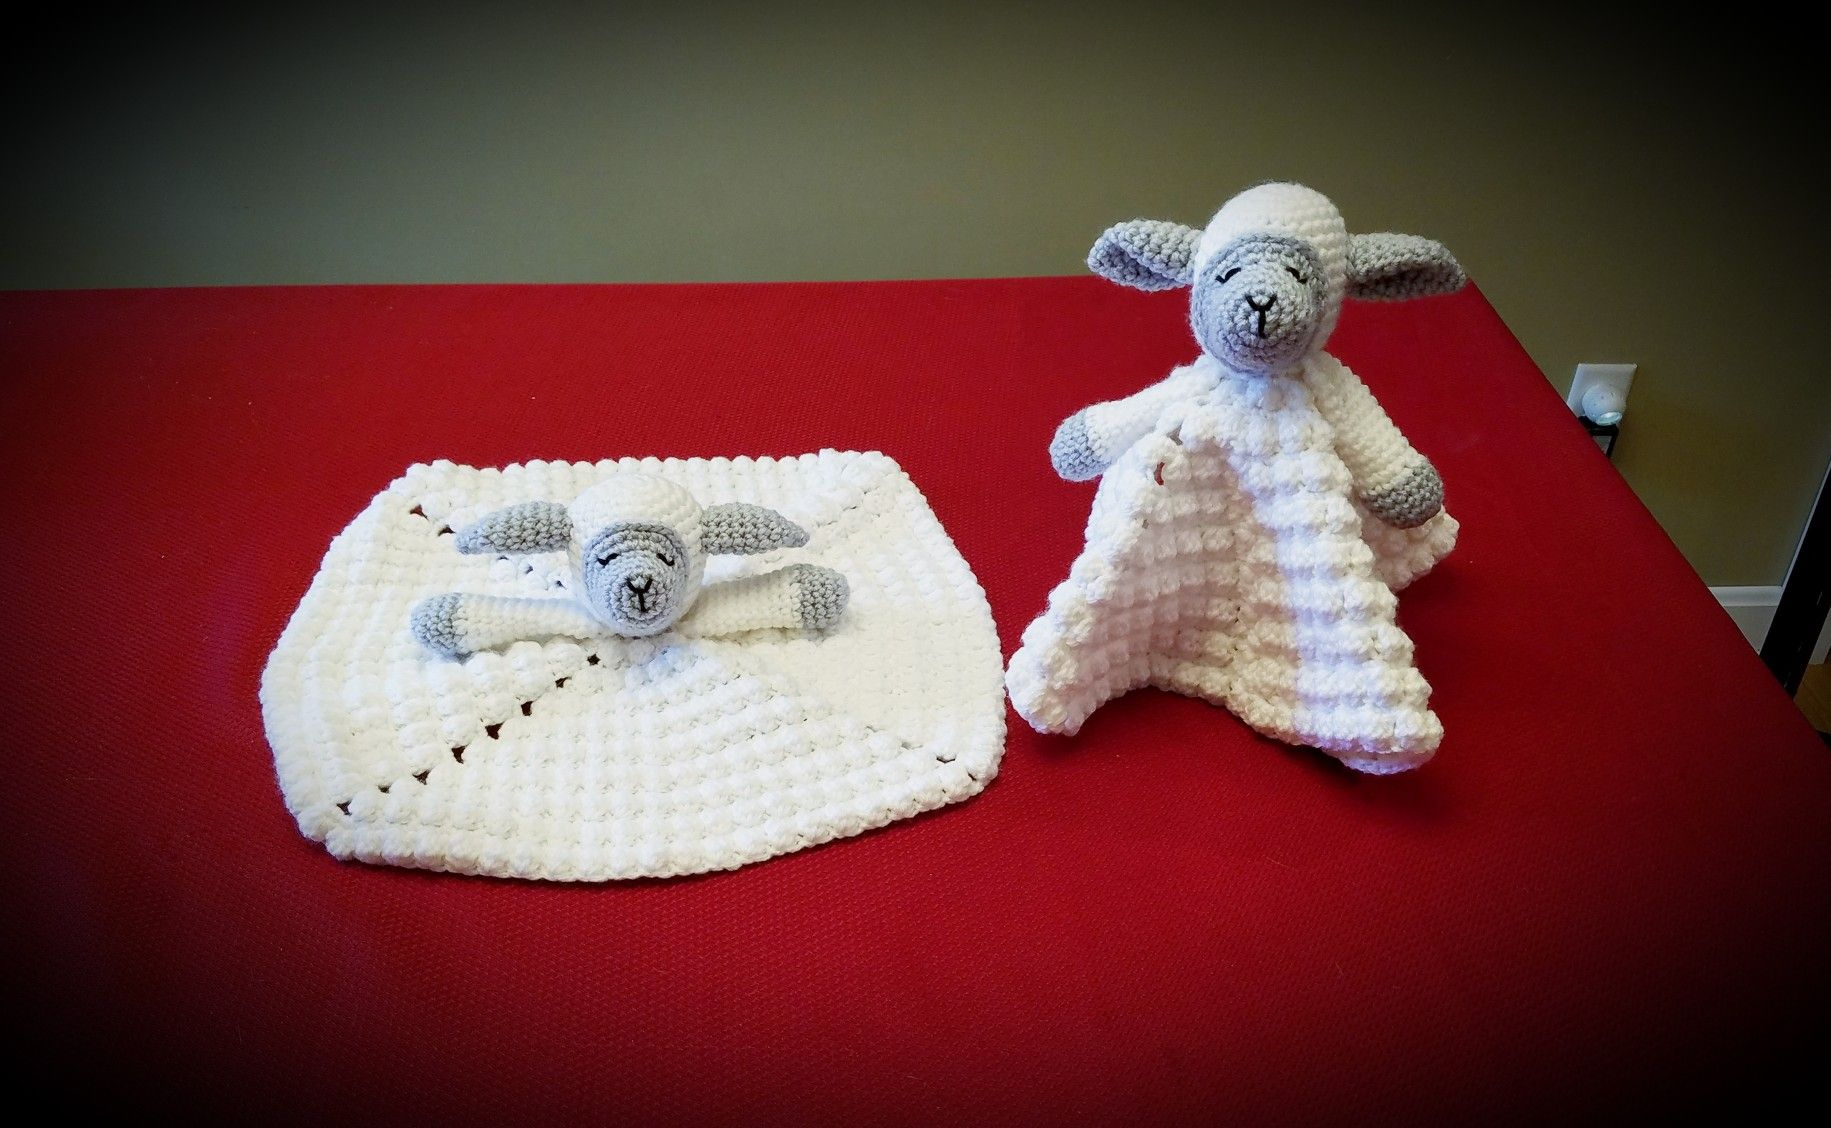 Sleepy lamb (sheep) baby security blanket